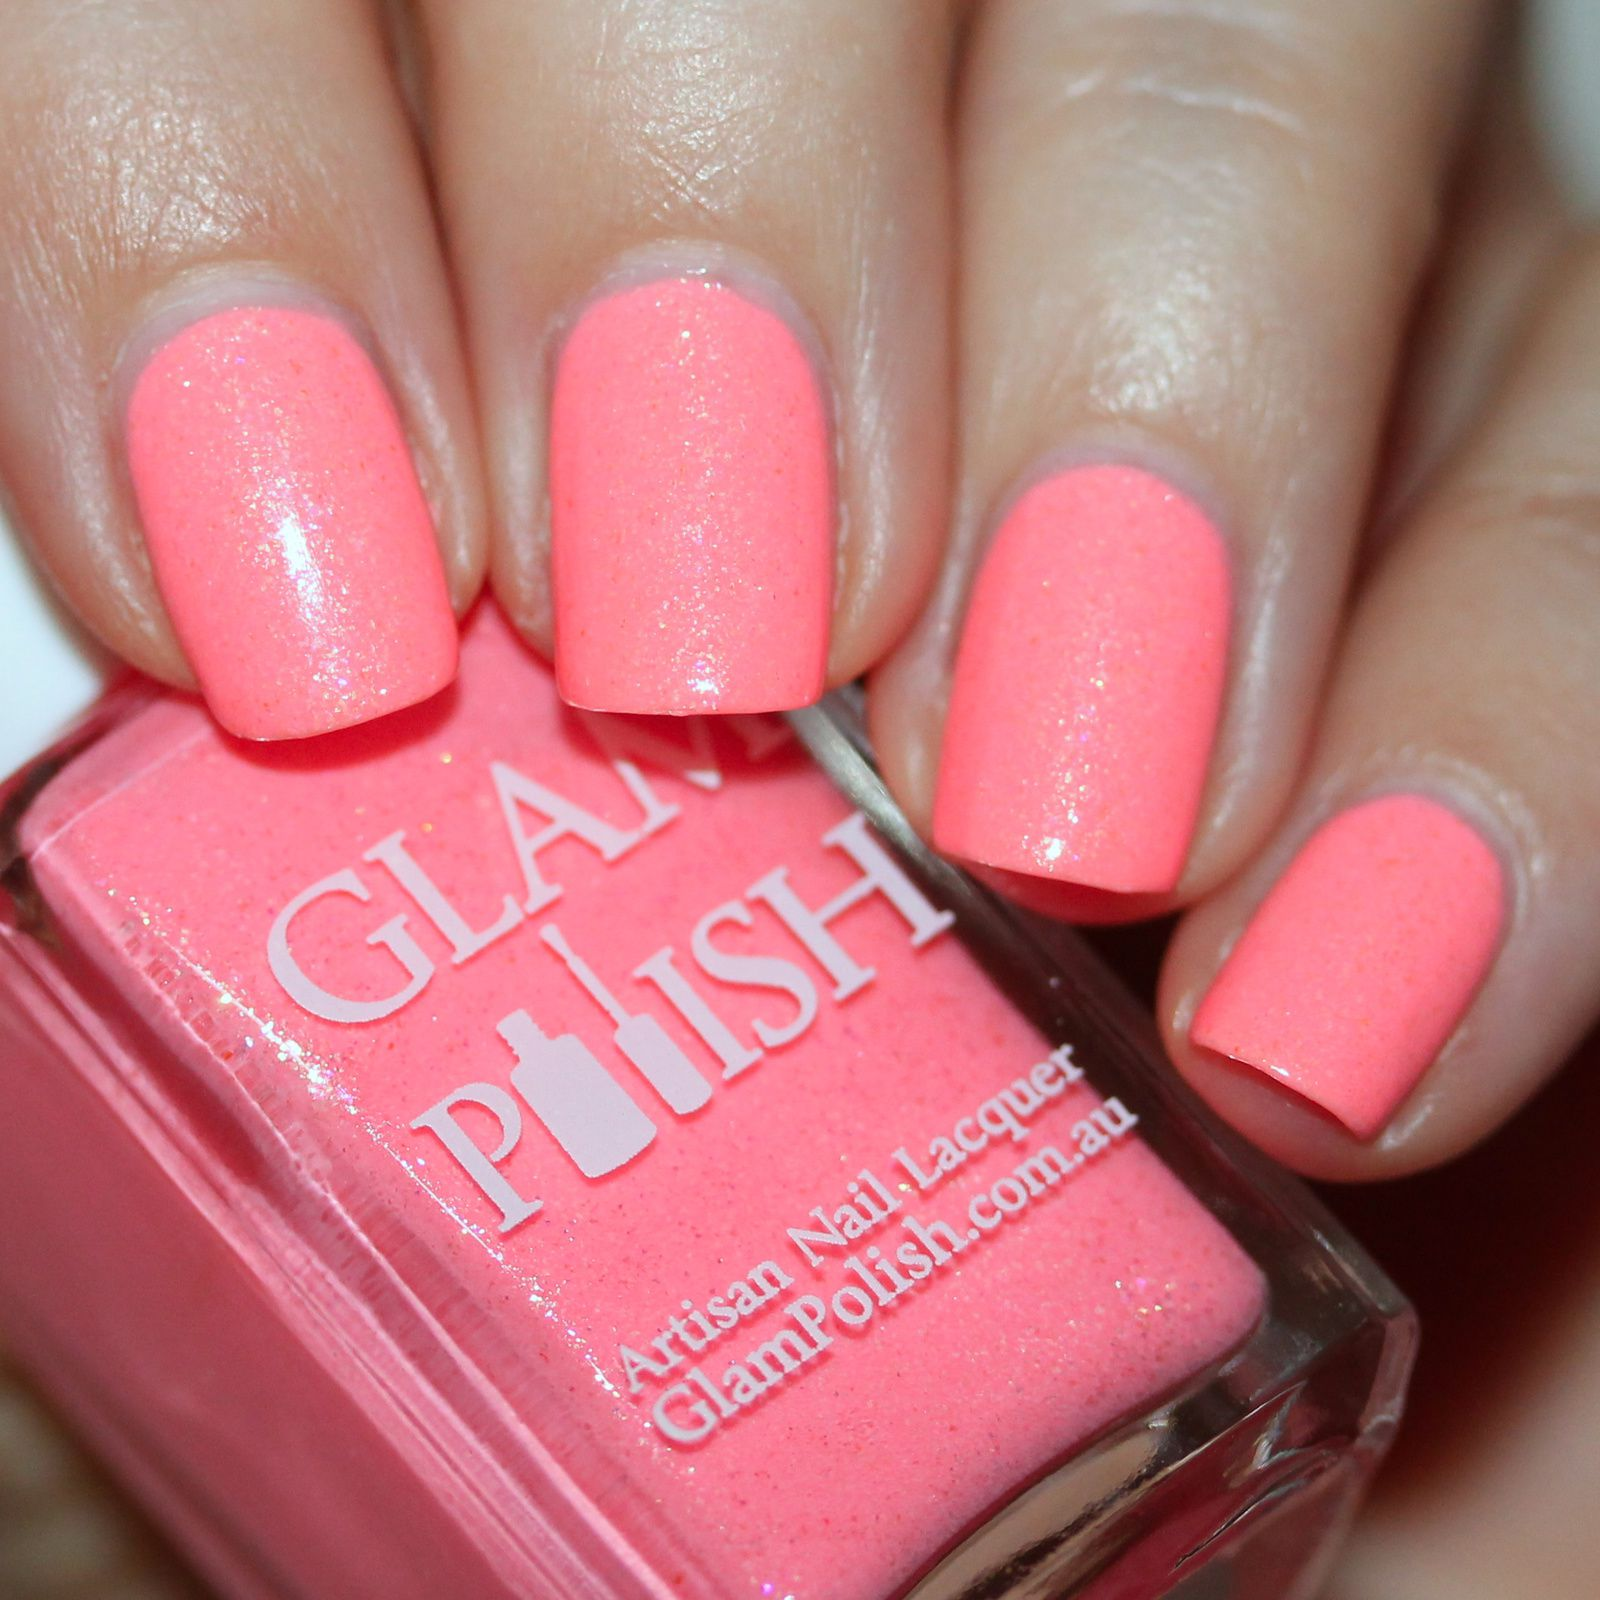 Duri Rejuvacote / Glam Polish Sweet Peach / HK Girl Top Coat